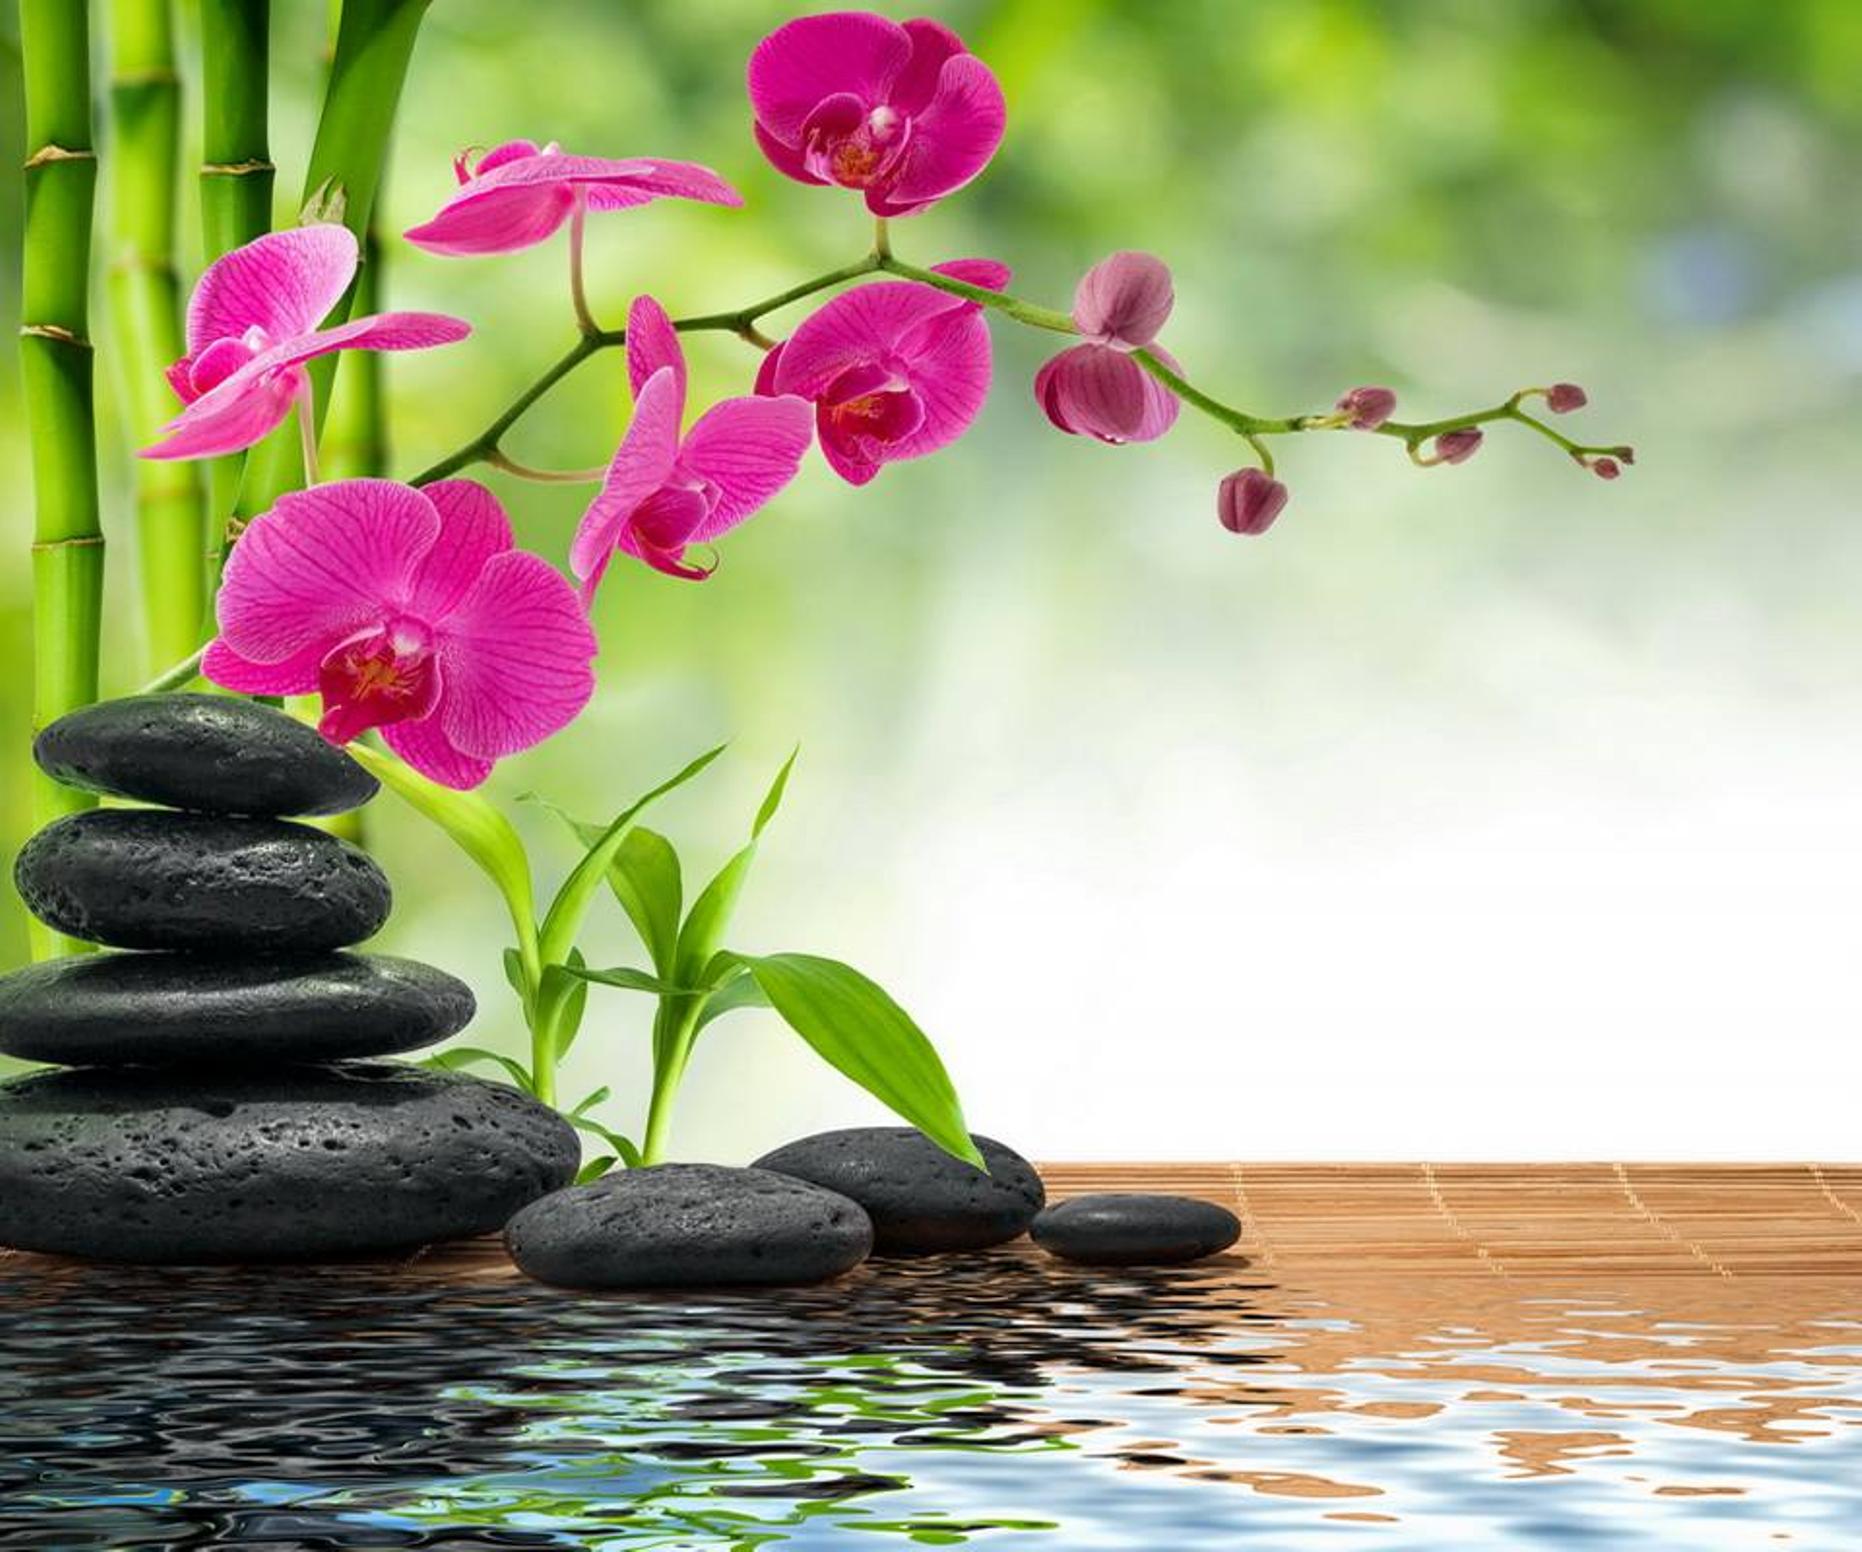 5 consjejos feng shui bienestar - Consejos de feng shui ...